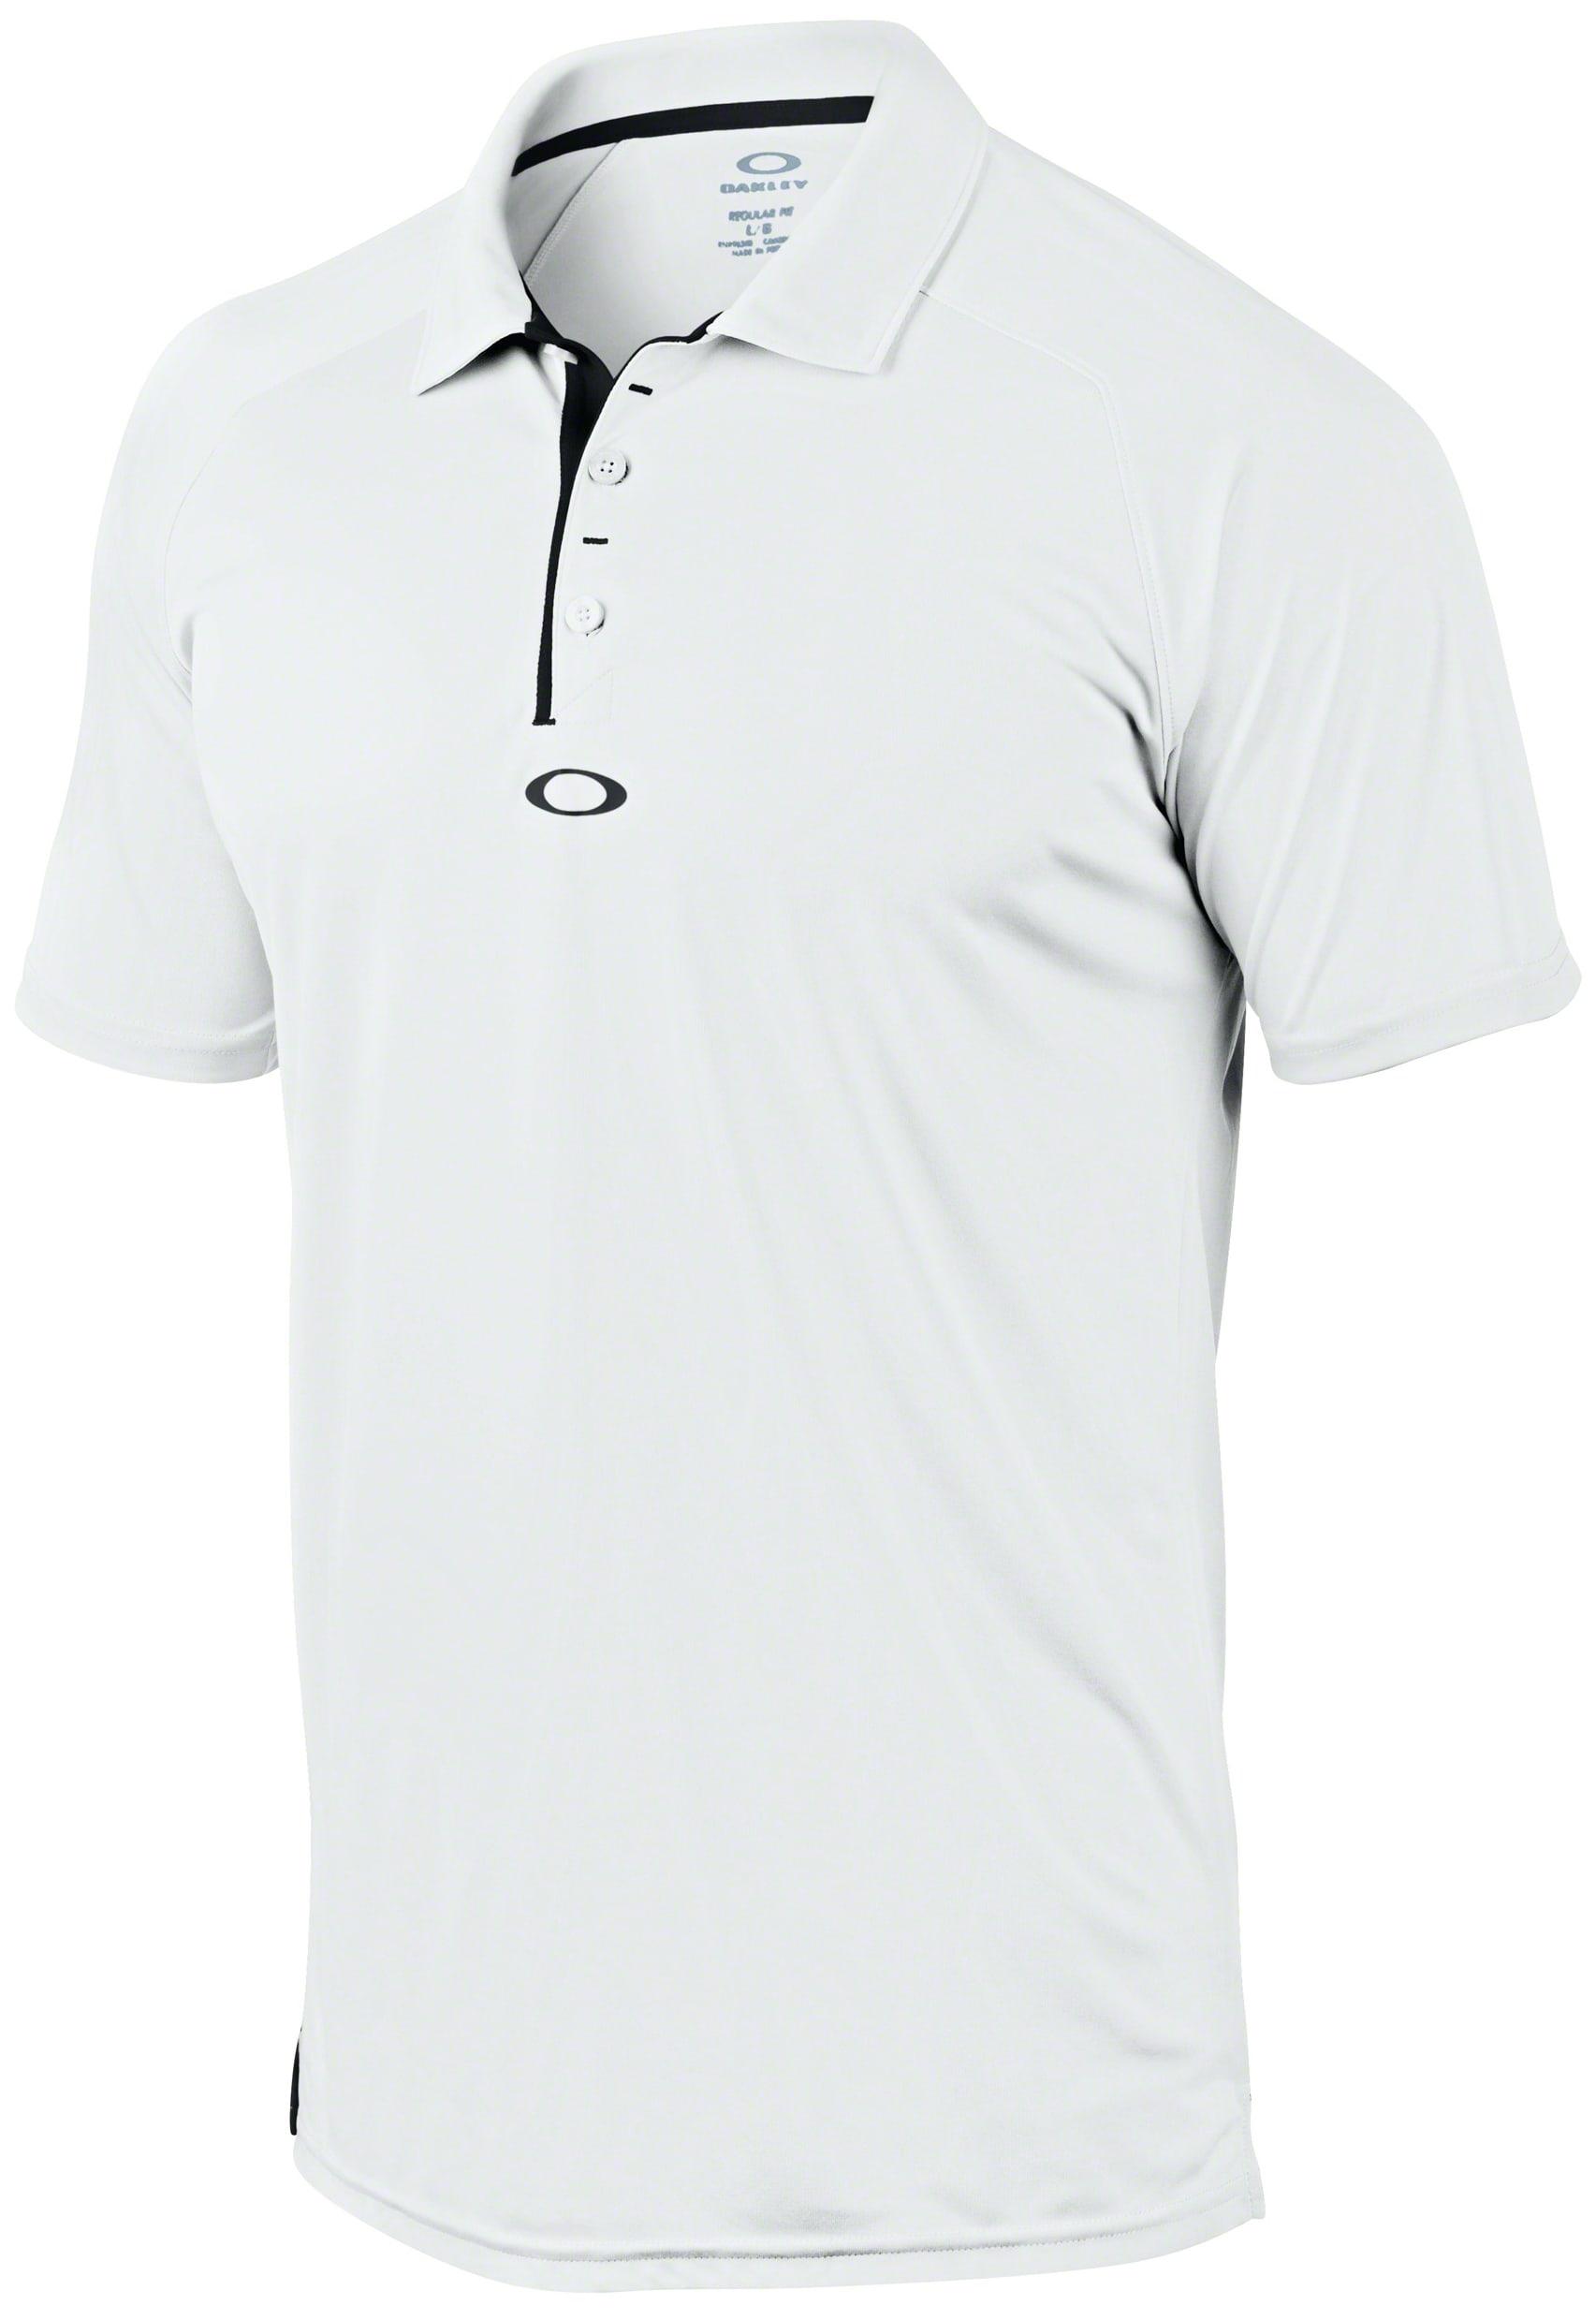 Womens Golf Shirts Clearance